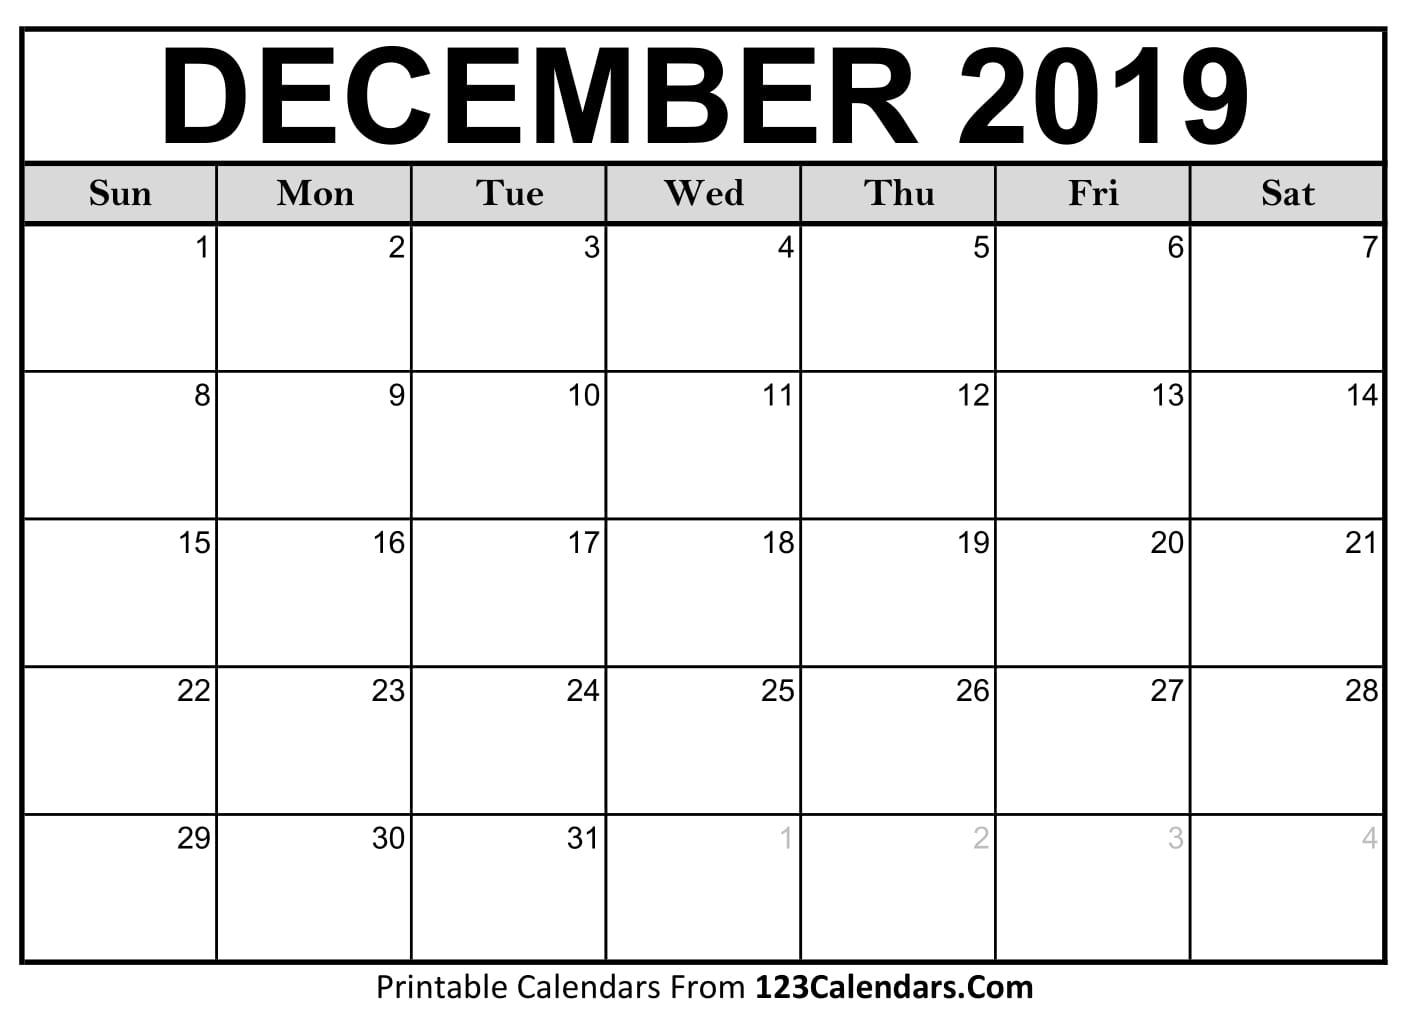 December 2019 Printable Calendar   123Calendars